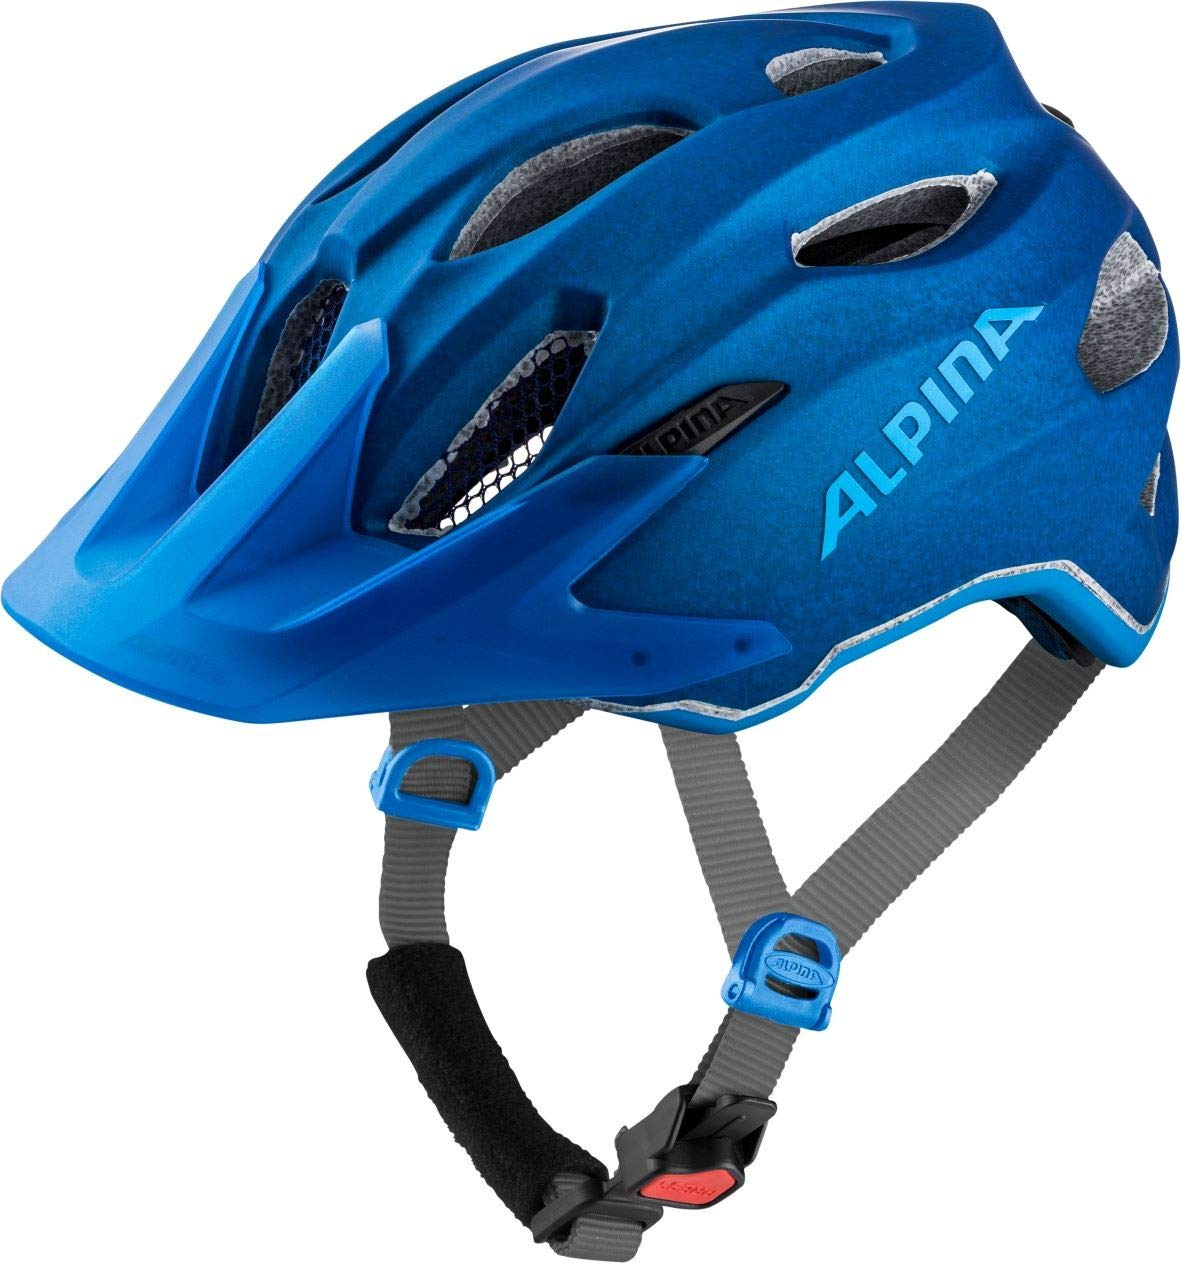 ALPINA Carapax JR Kinder-Fahrradhelm // Blue, Ausfuuml;hrung:Blue